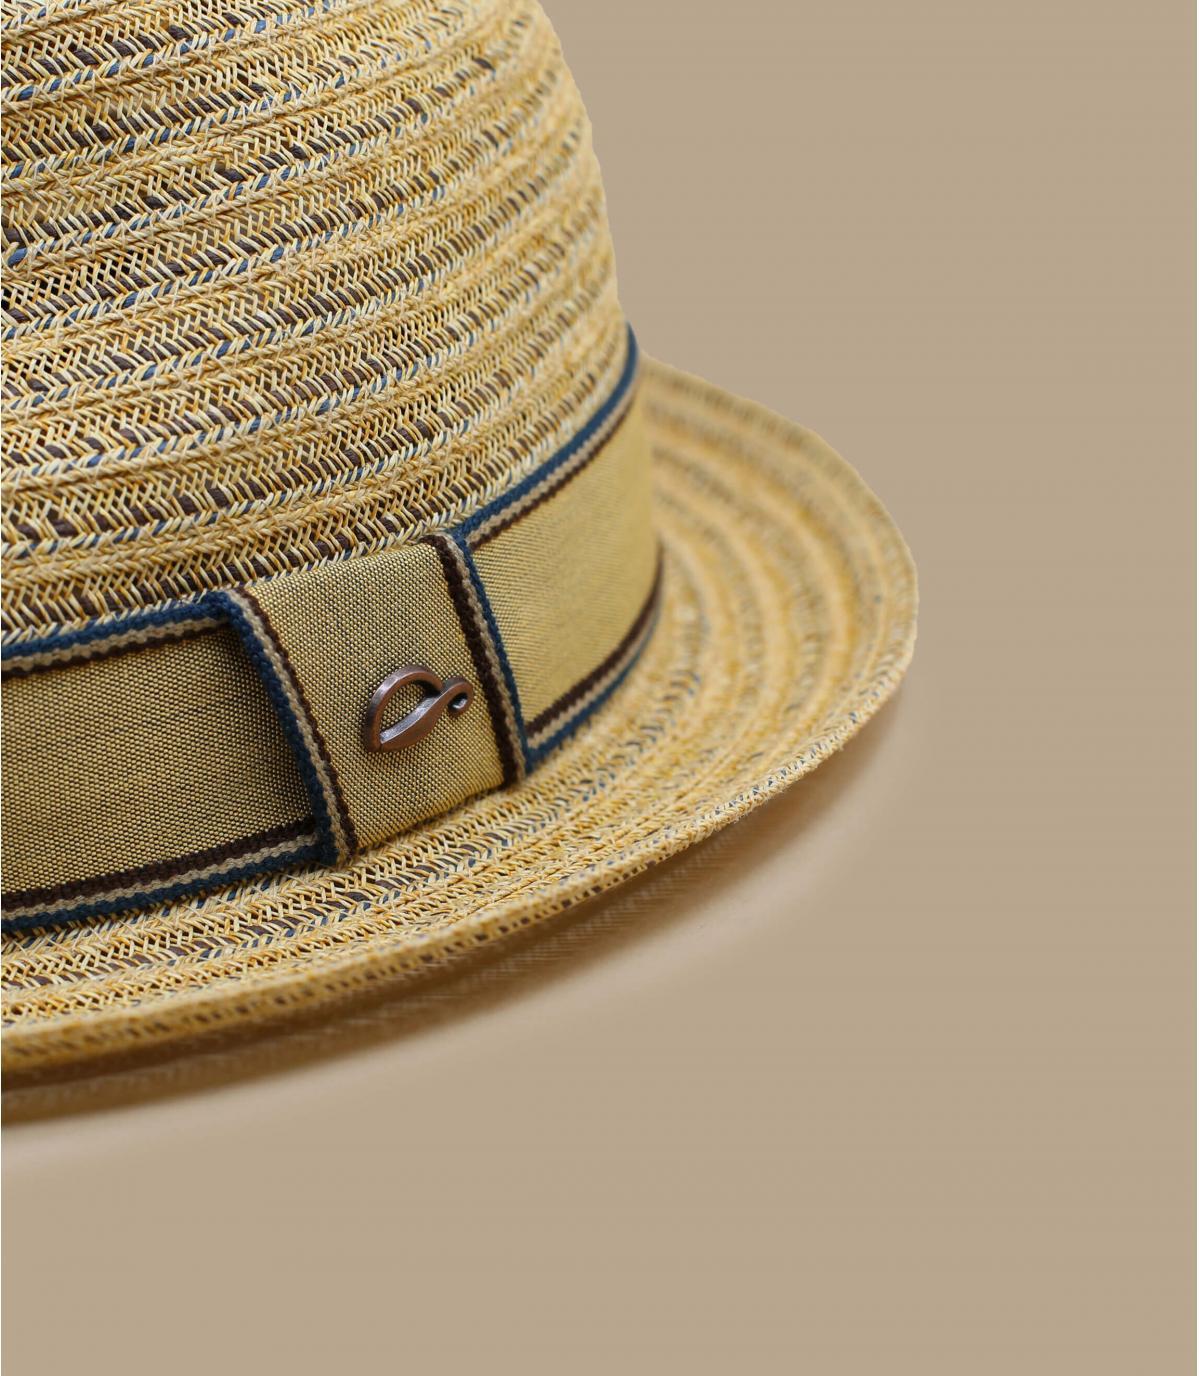 Details Newman Toyo beige - Abbildung 3